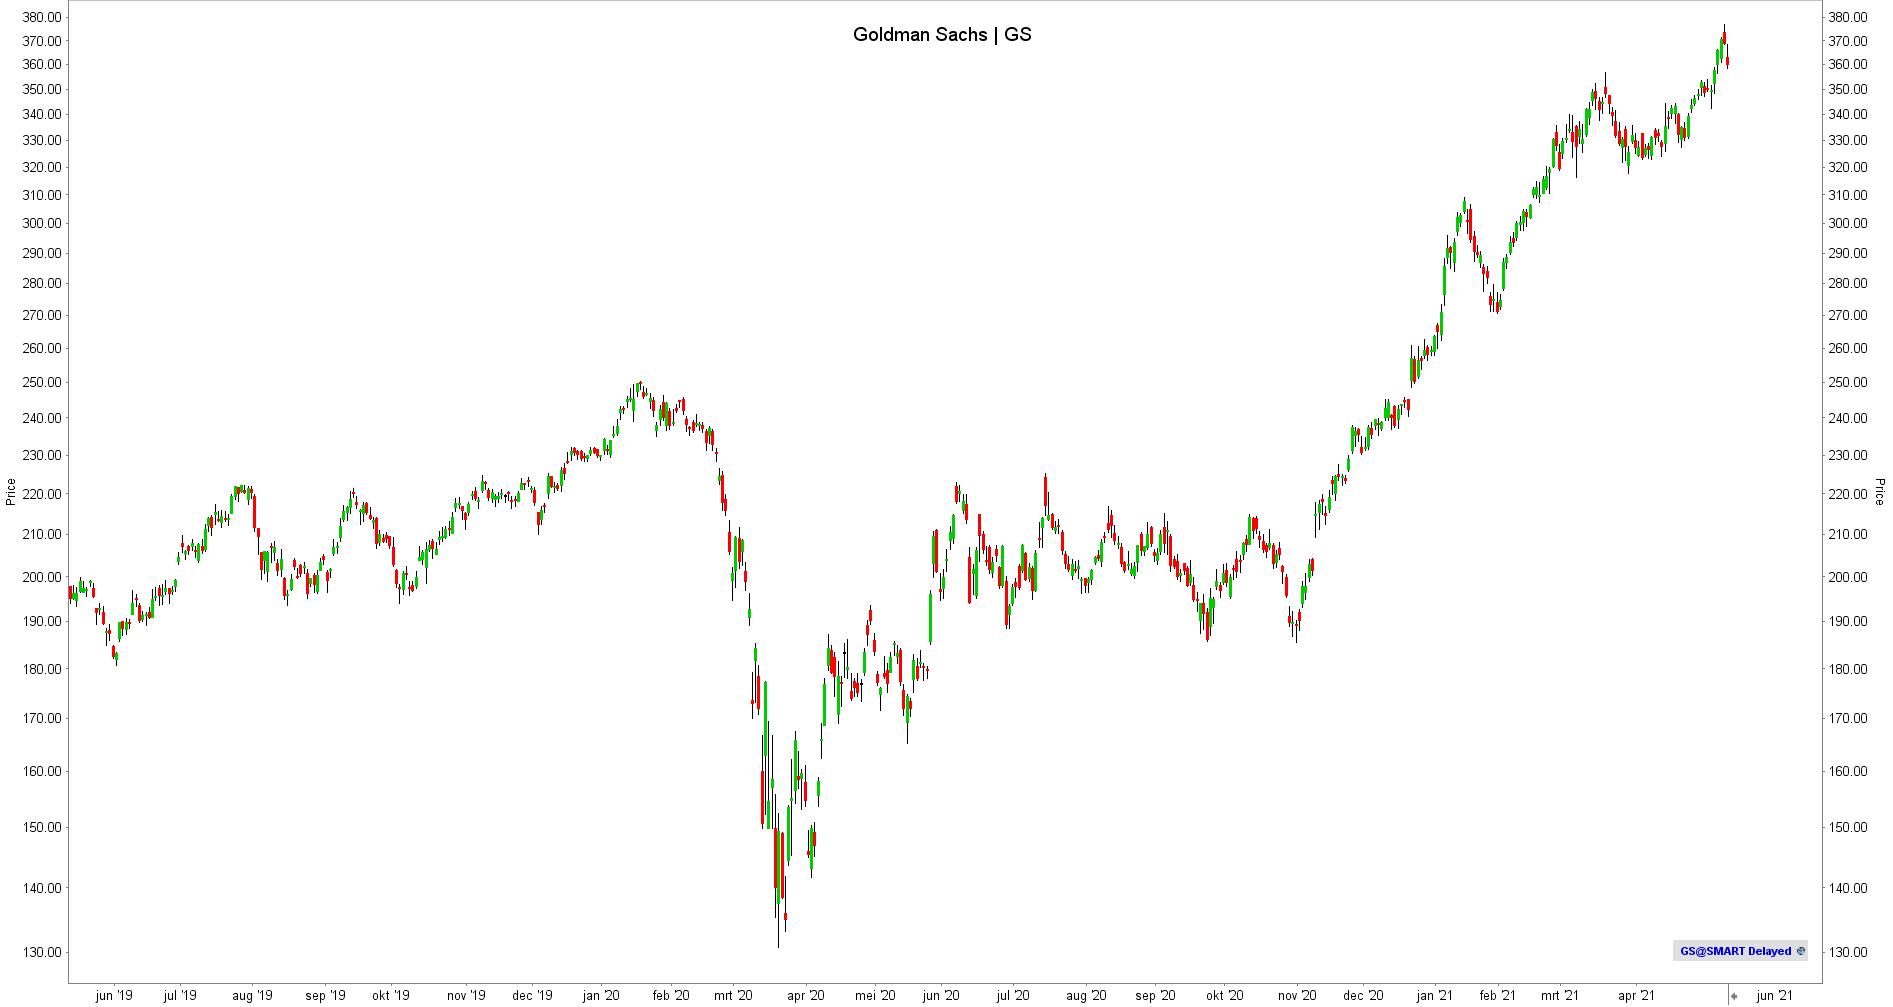 Goldman Sachs koers